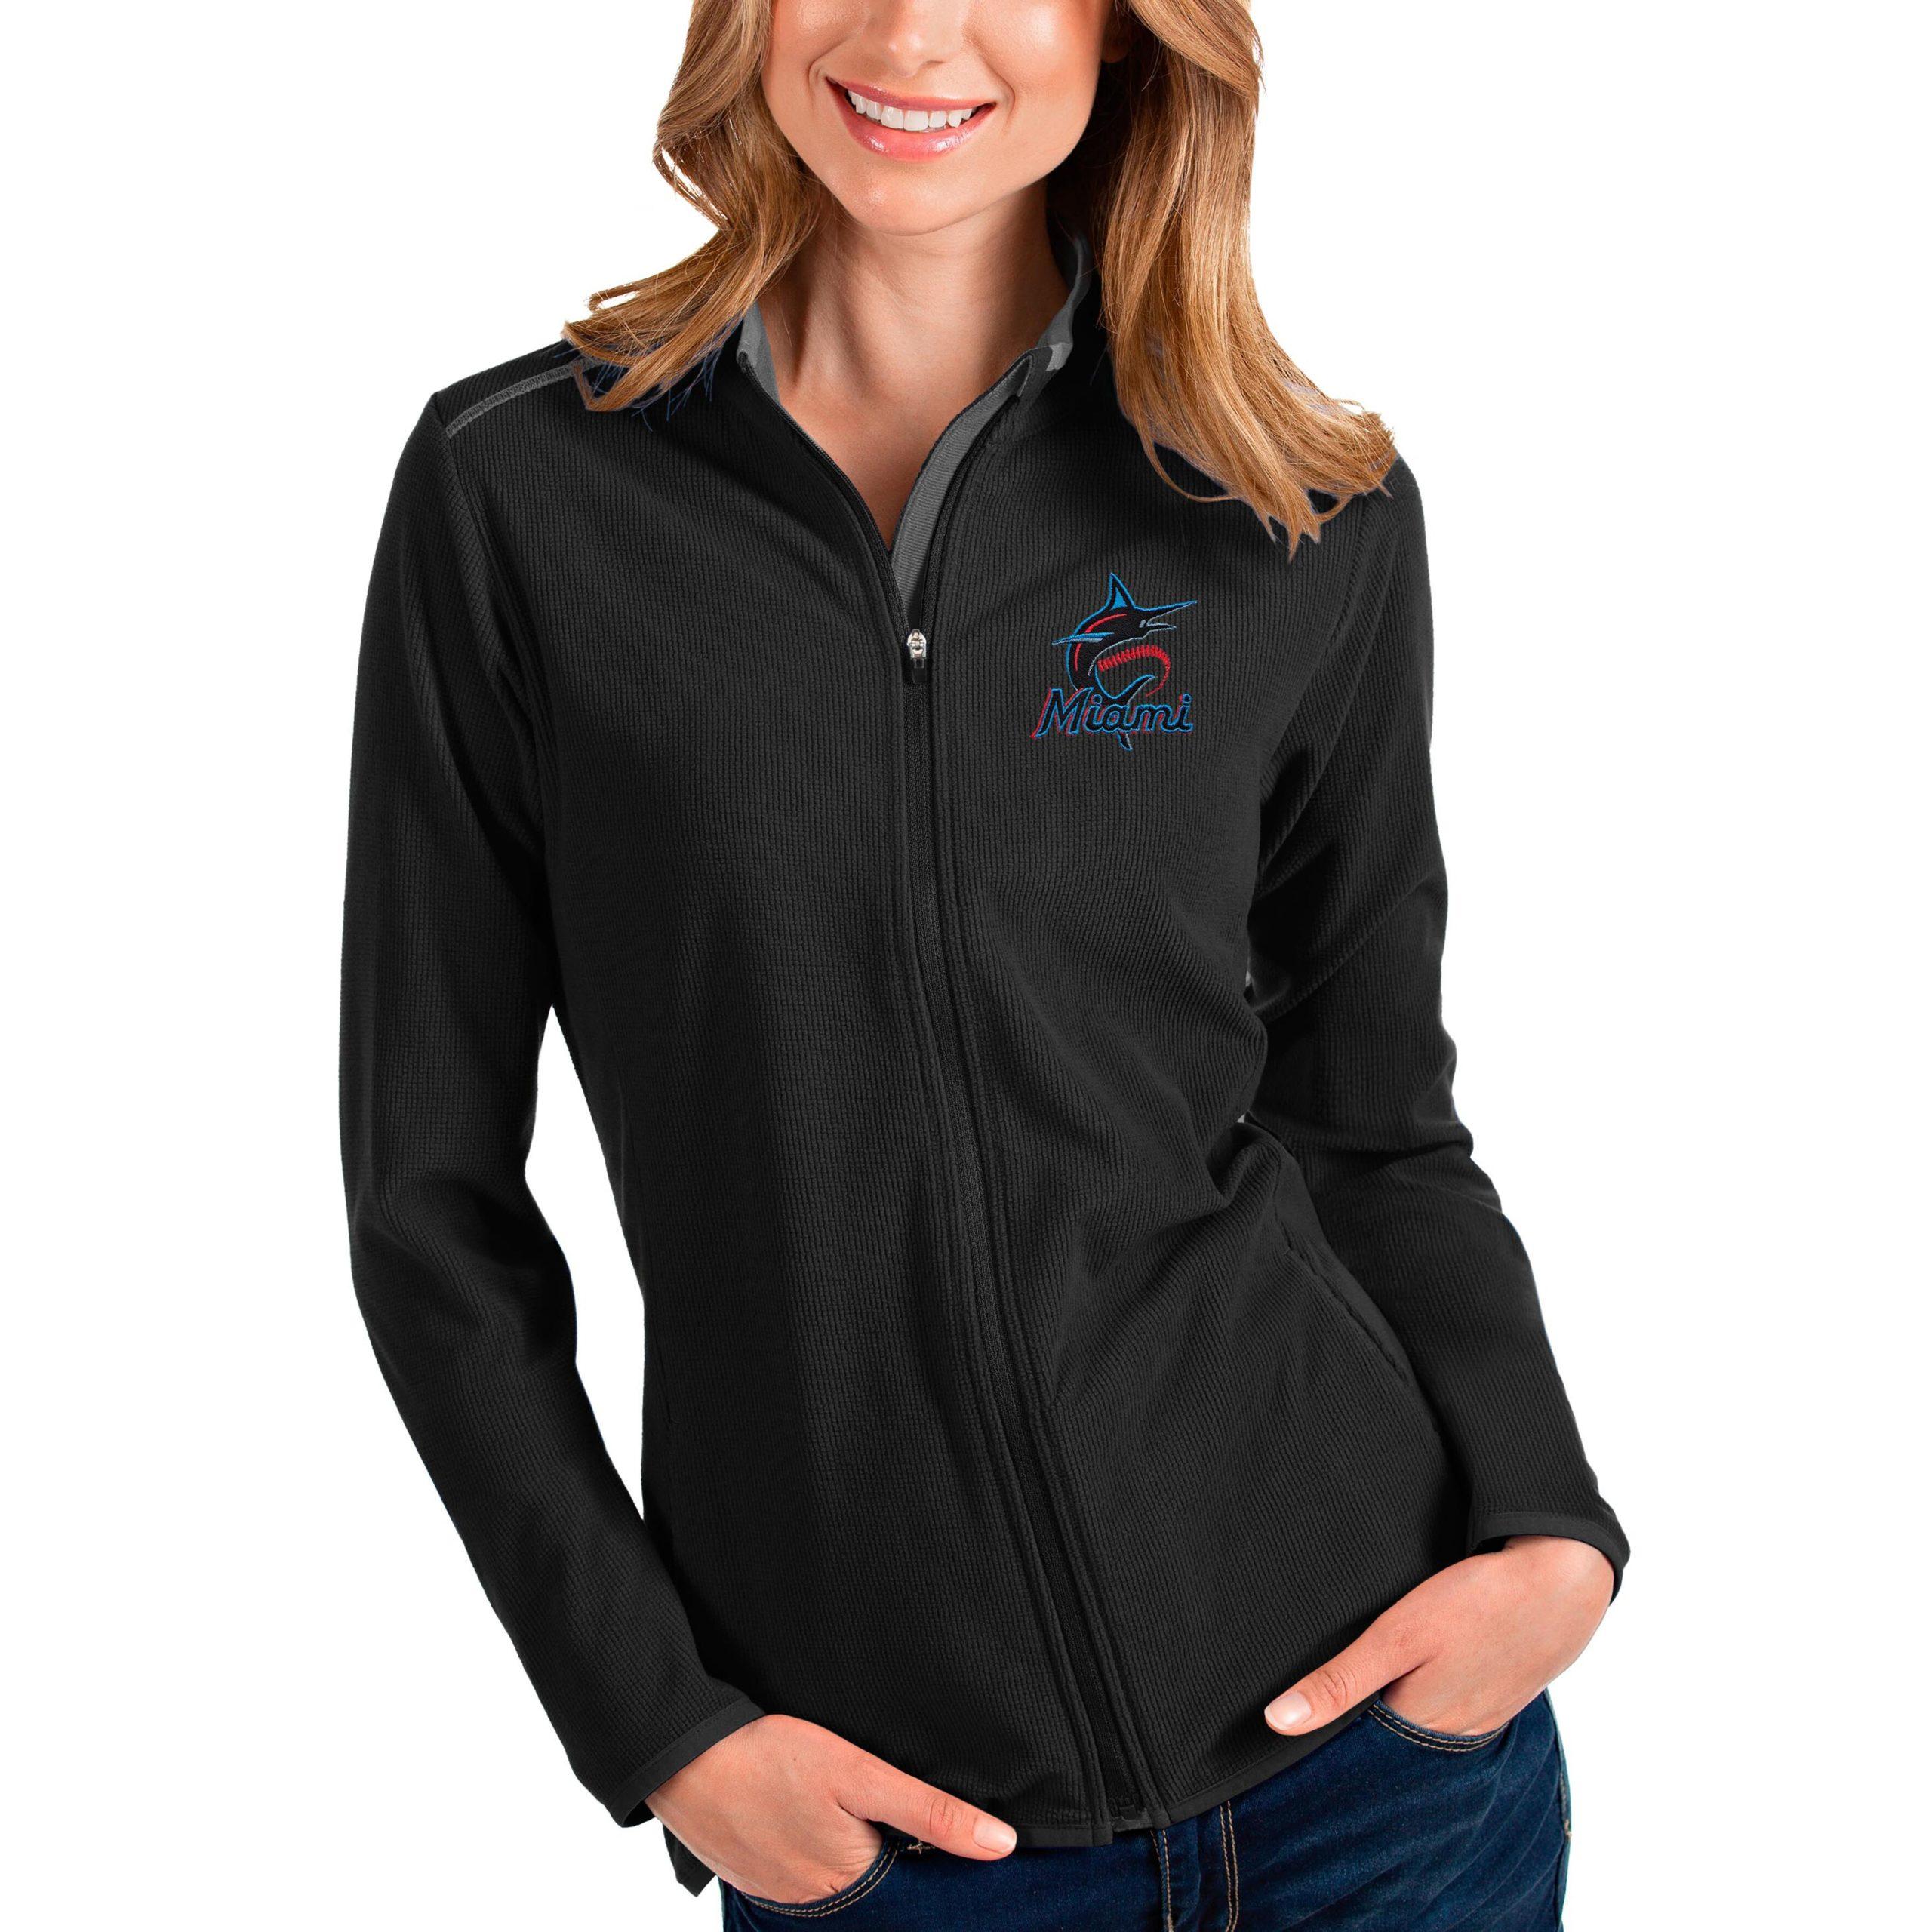 Miami Marlins Antigua Women's Glacier Full-Zip Jacket - Black